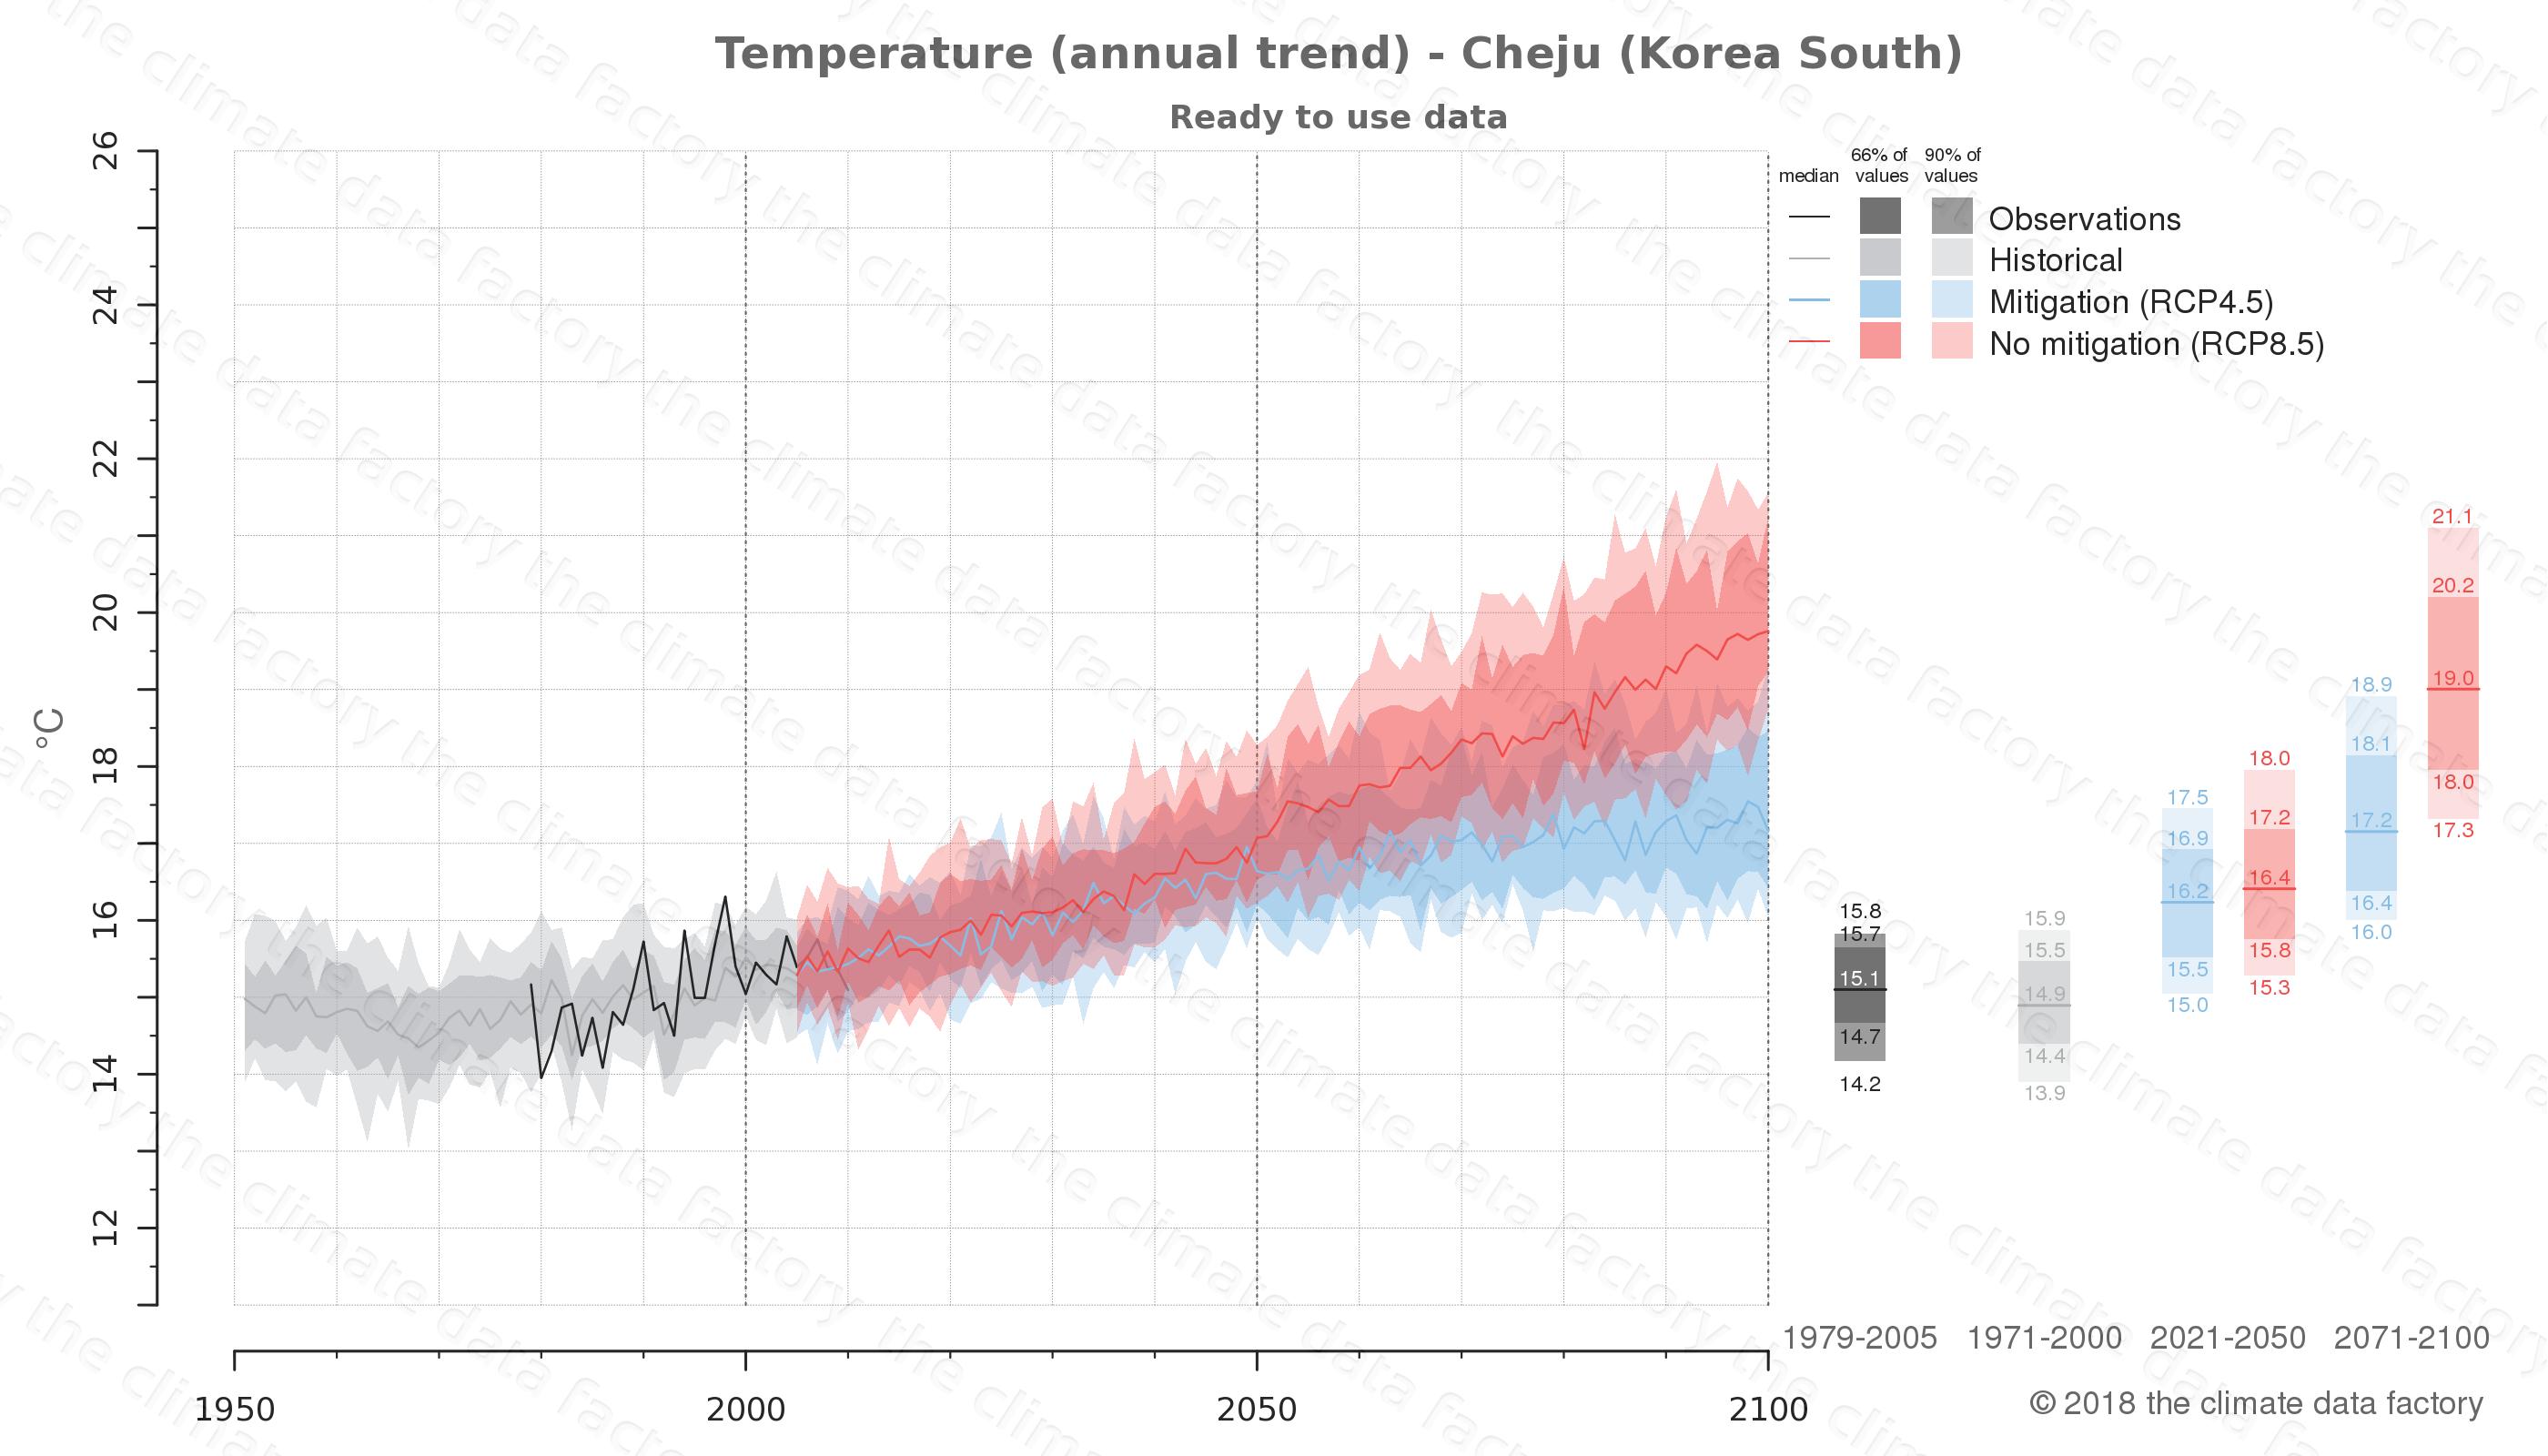 climate change data policy adaptation climate graph city data temperature cheju south korea